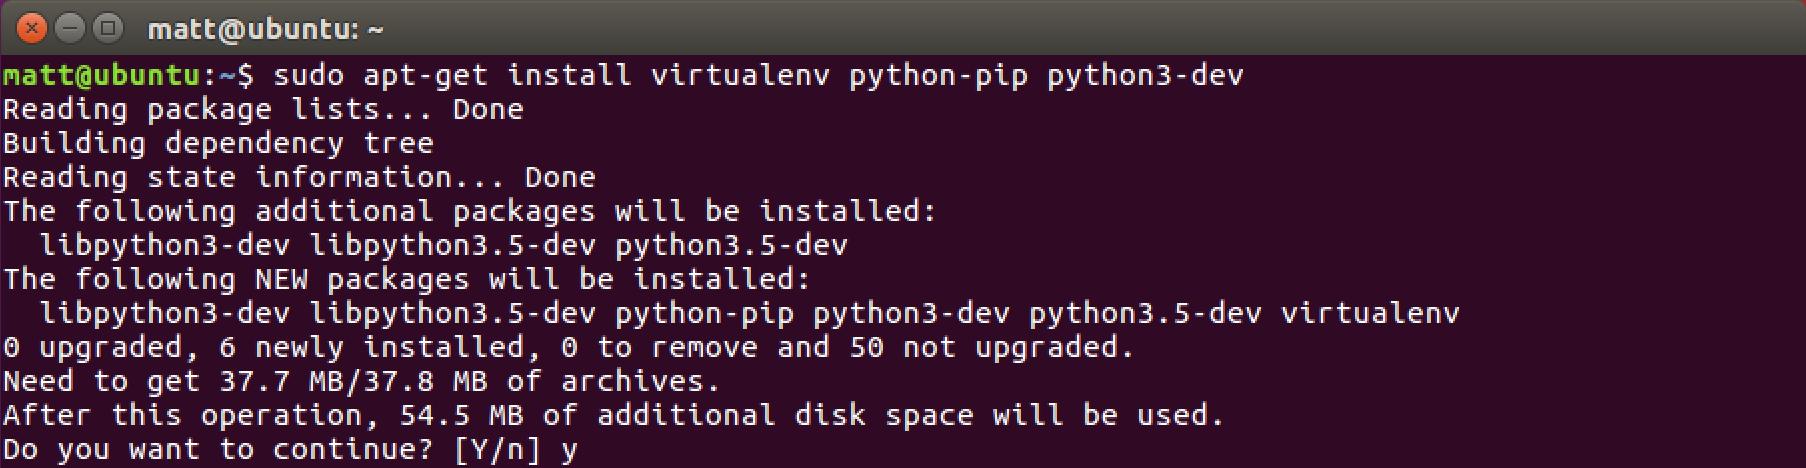 install virtualenv python